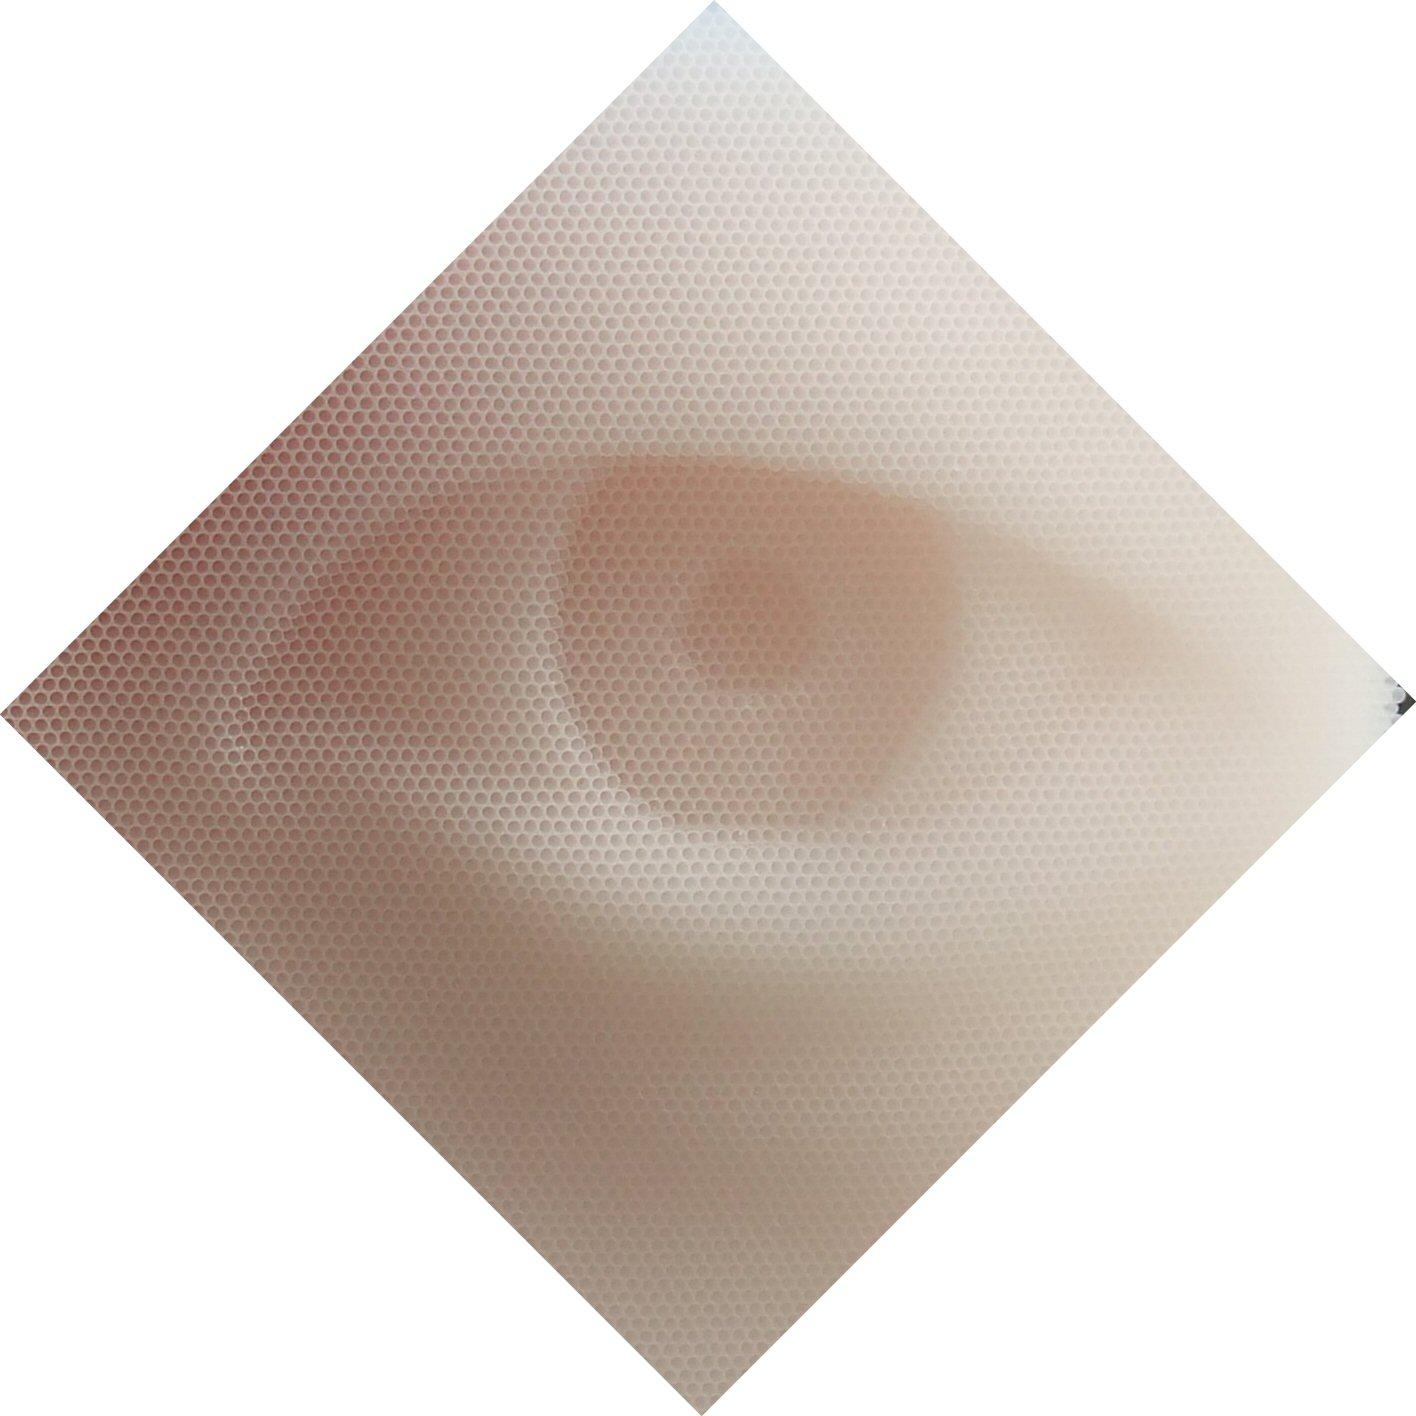 see2_2015_straw_42.5x42.5x12cm